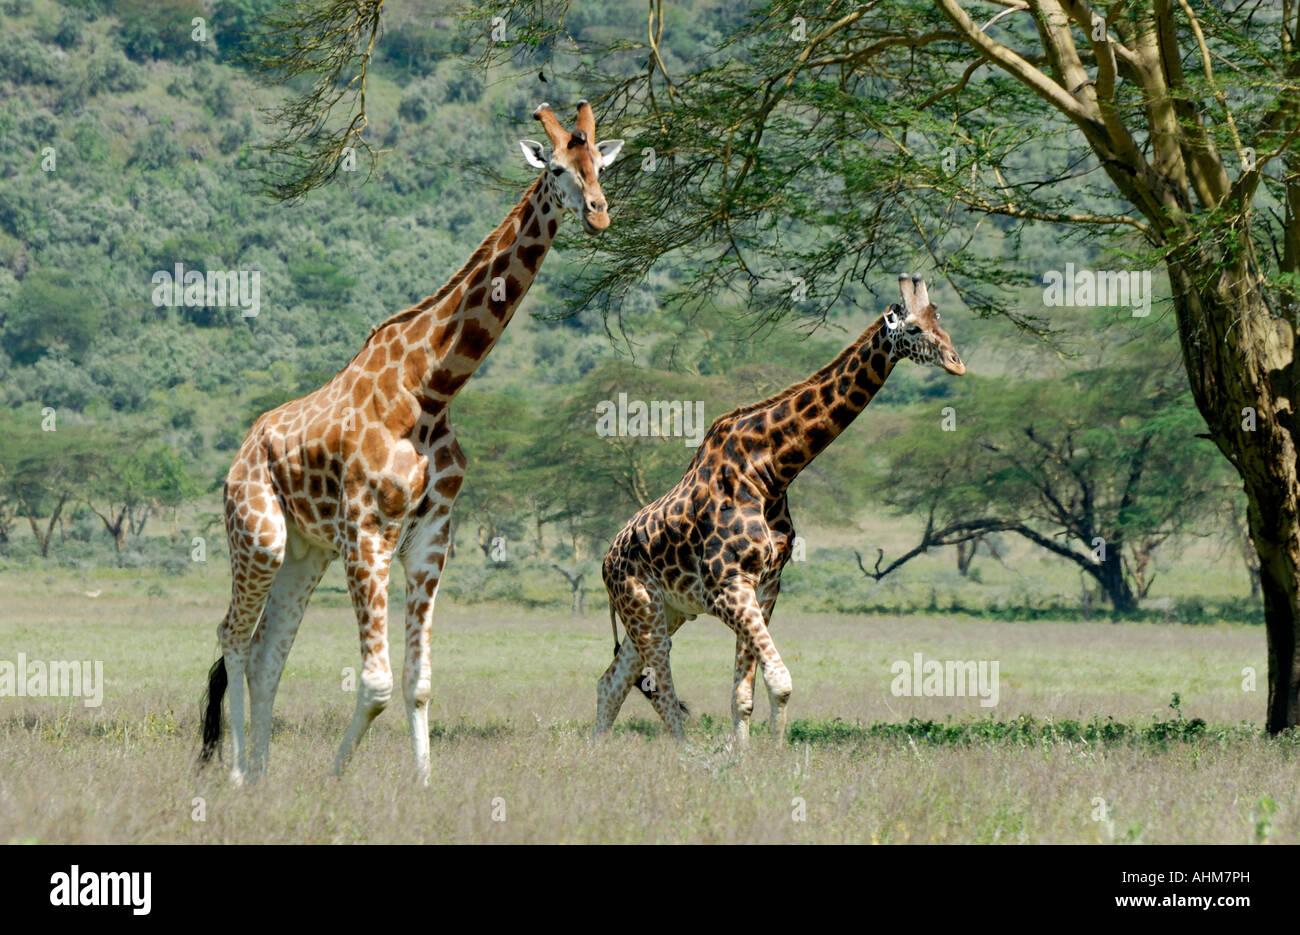 Two adult male Rothschild s Giraffe in Lake Nakuru National Park Kenya East Africa - Stock Image